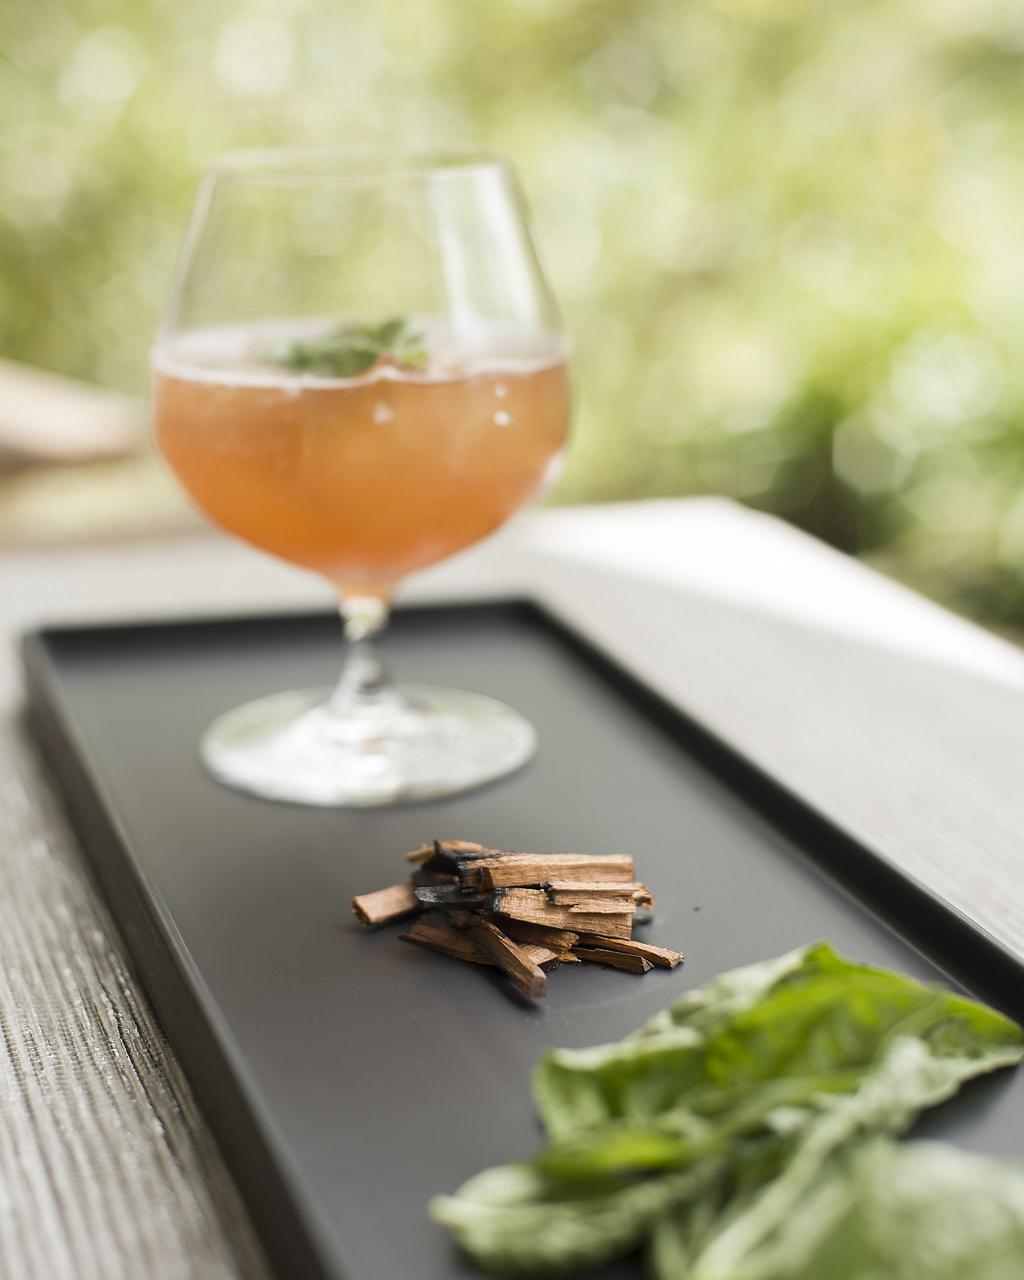 SMOKED BASIL   garden basil, fresh pressed lime, cherry wood smoke, maraschino liqueur, aged rum